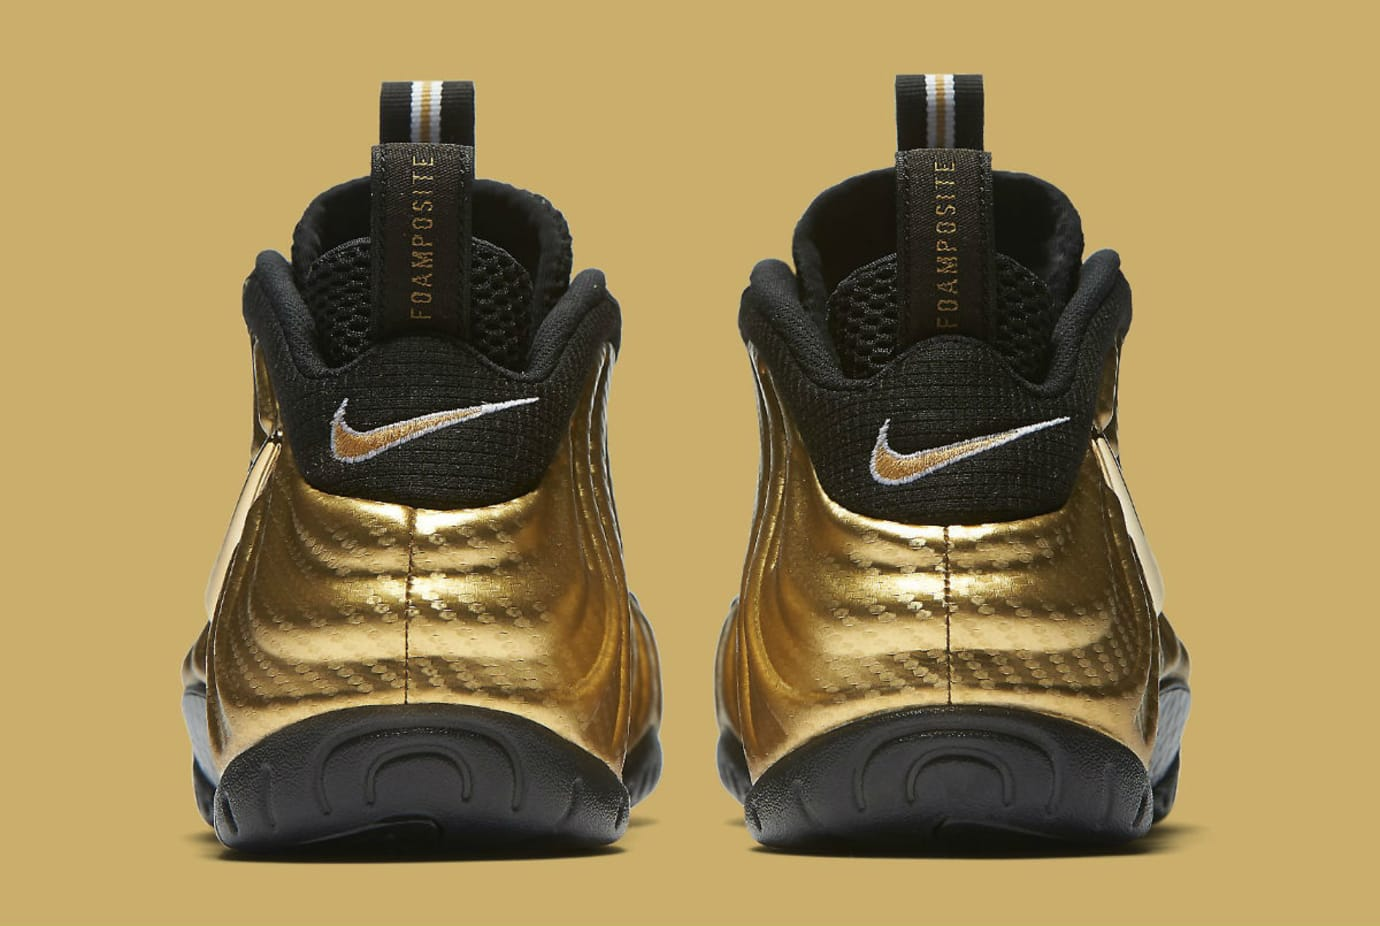 aa3c369becc Nike Air Foamposite Pro Metallic Gold Release Date Heel 624041-701